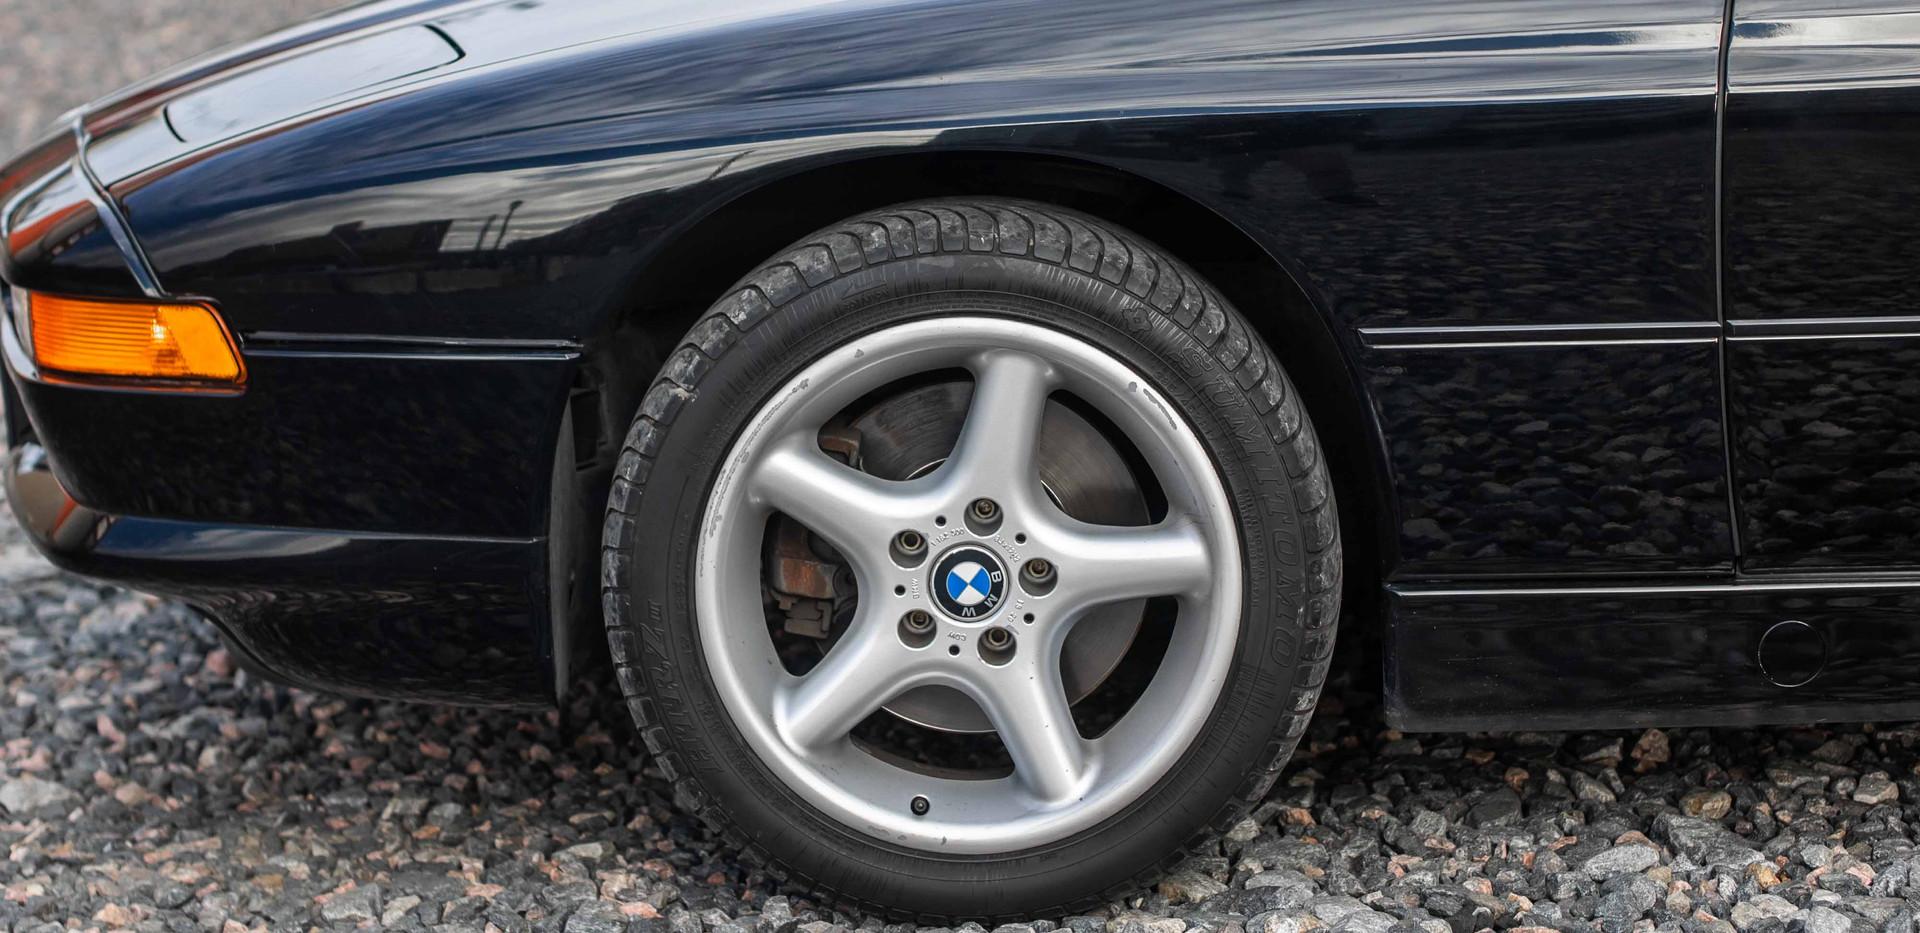 Driver_Side_Front_Wheel_850.jpg